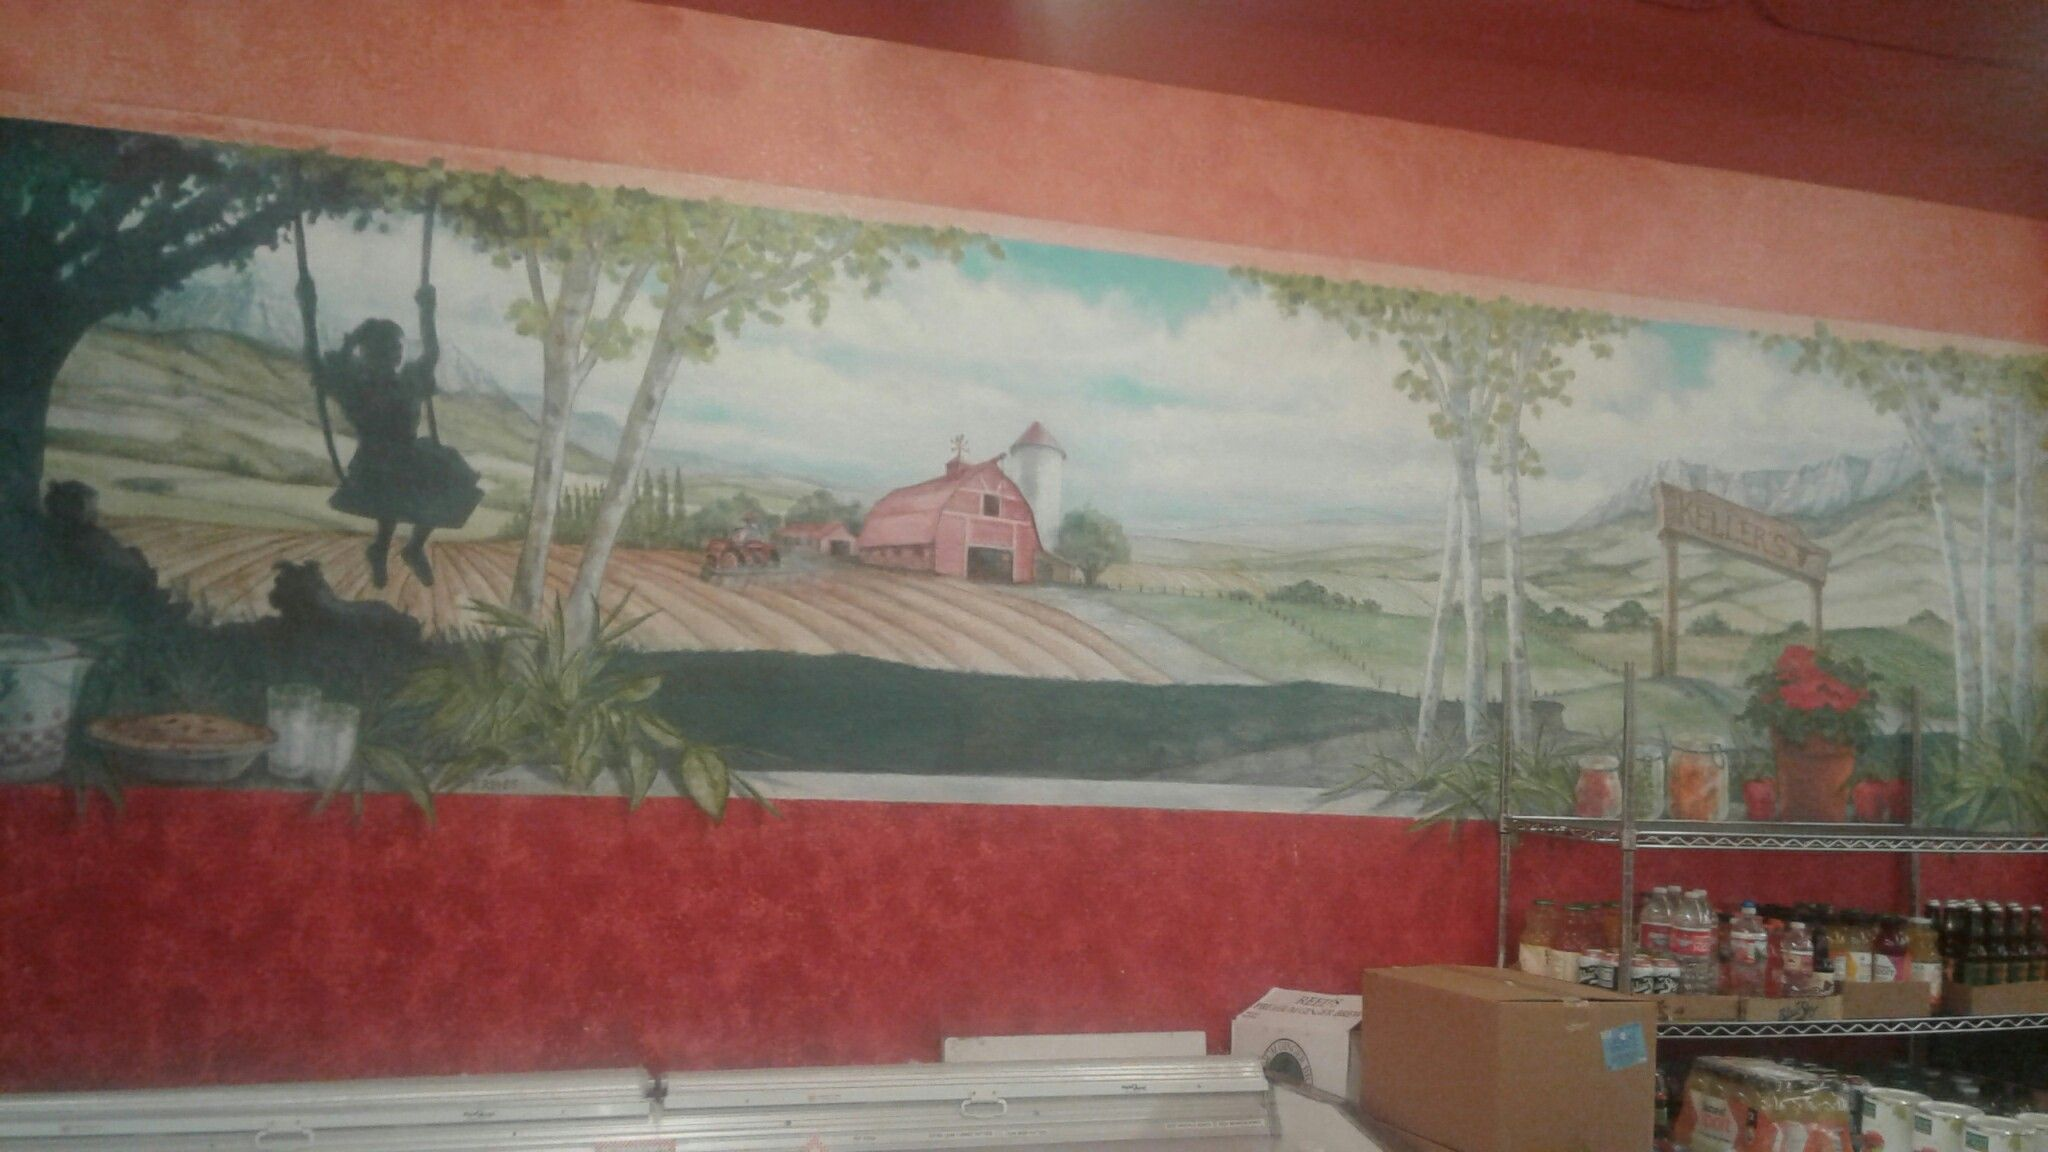 #farm #farmhouse #house #pie #milk #food #cookies #tree #children #art #nature #rurallife #rural #life #family #children #kids #painting